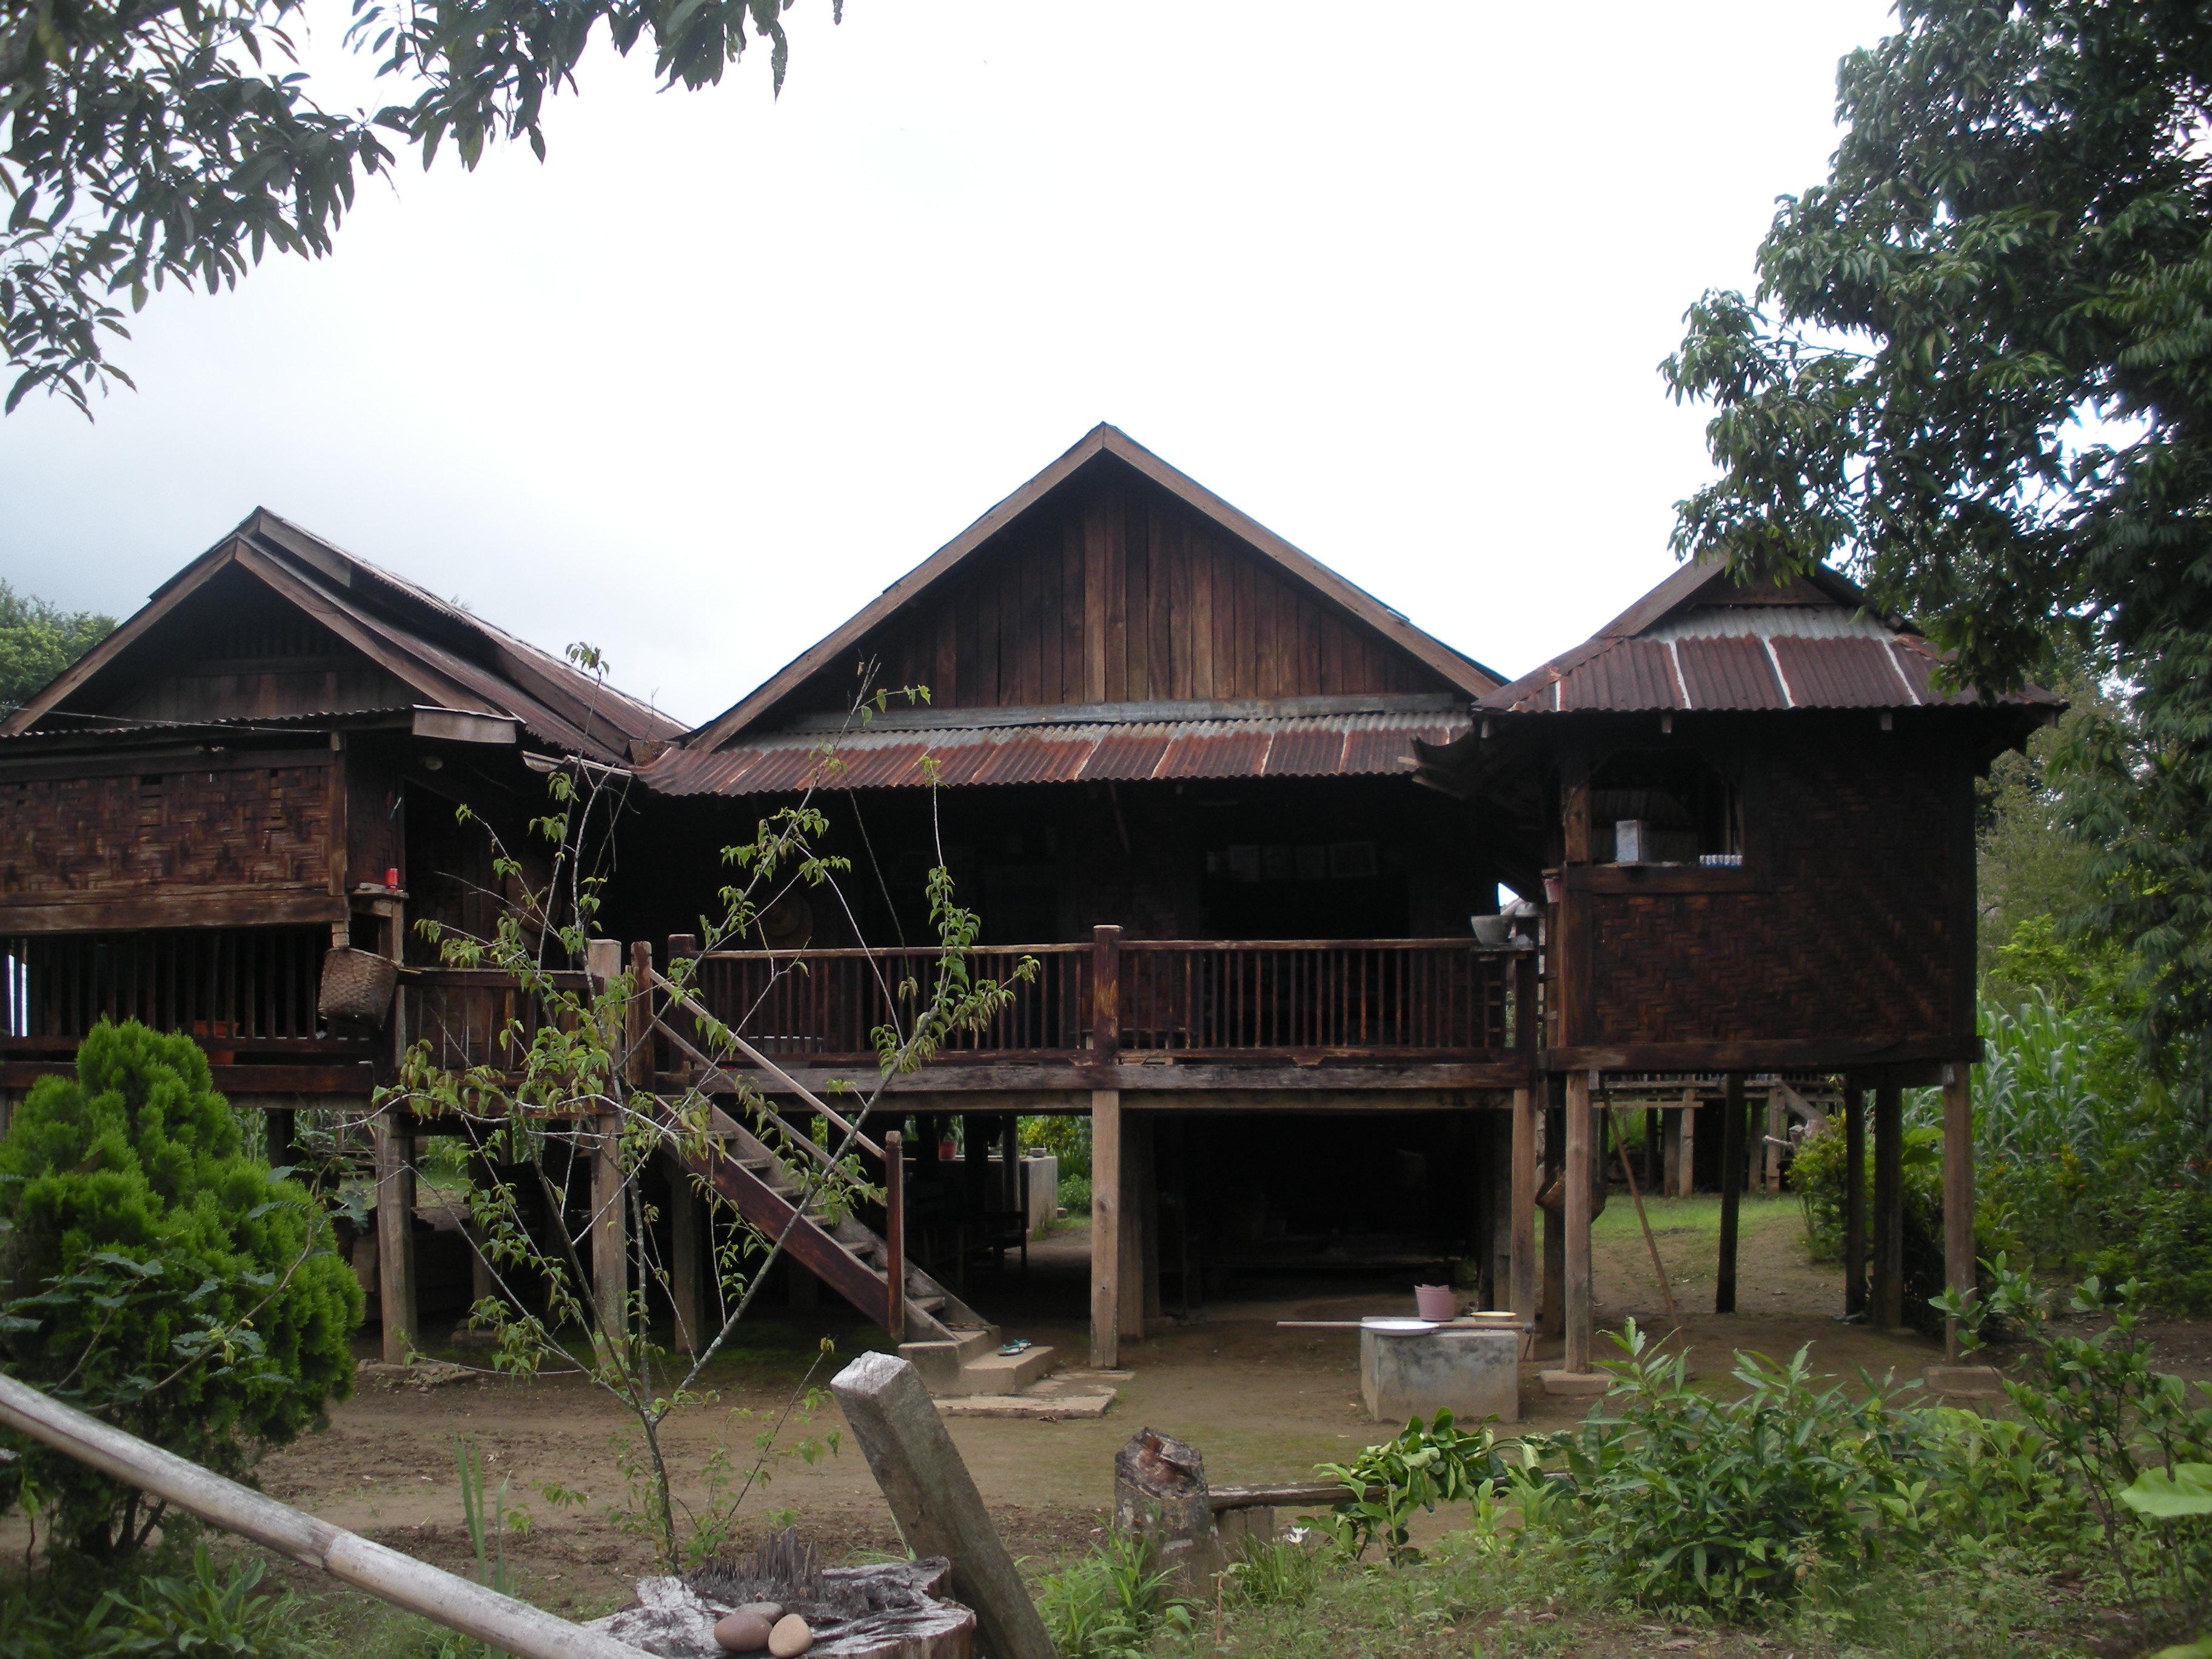 Hsibaw Shan Village[1]